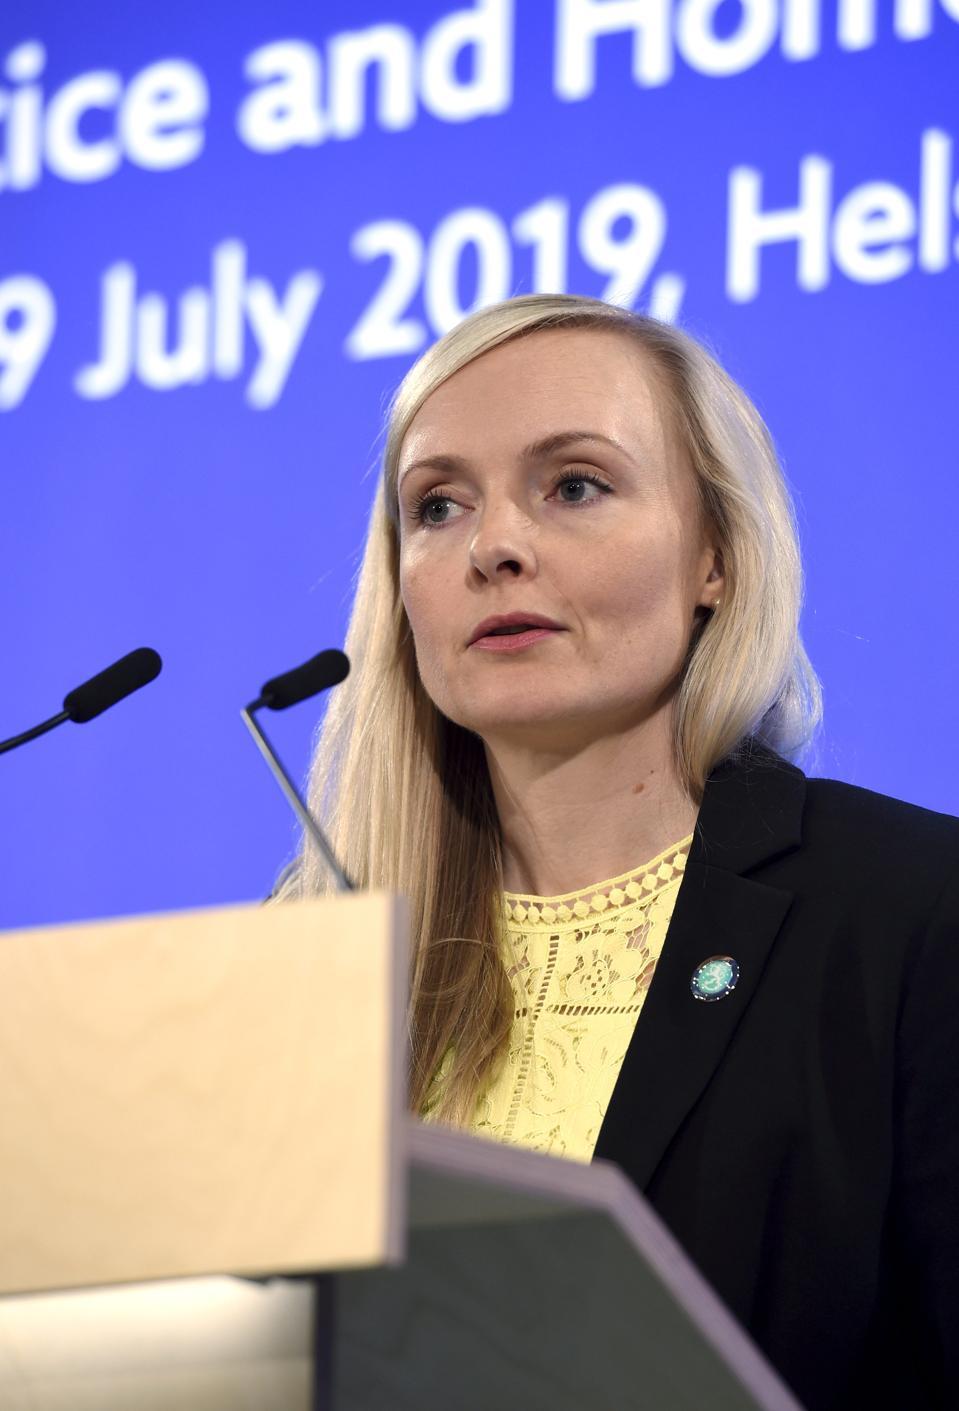 FINLAND-EU-DIPLOMACY-MIGRATION-REFUGEE-IMMIGRATION